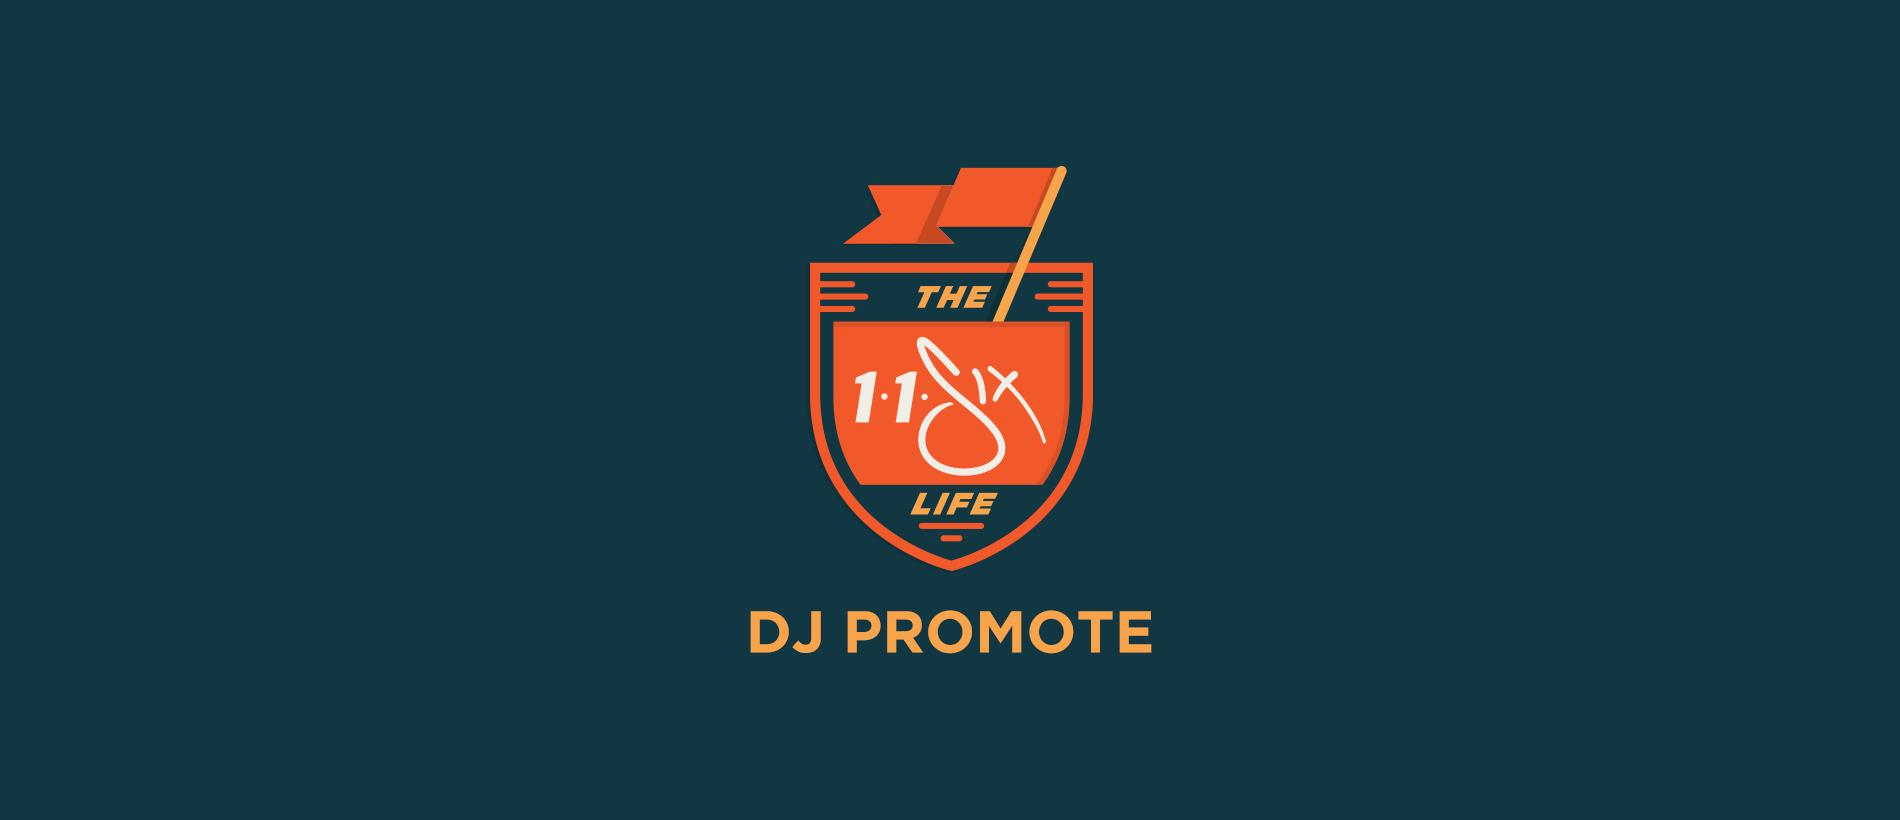 116 Life x DJ Promote